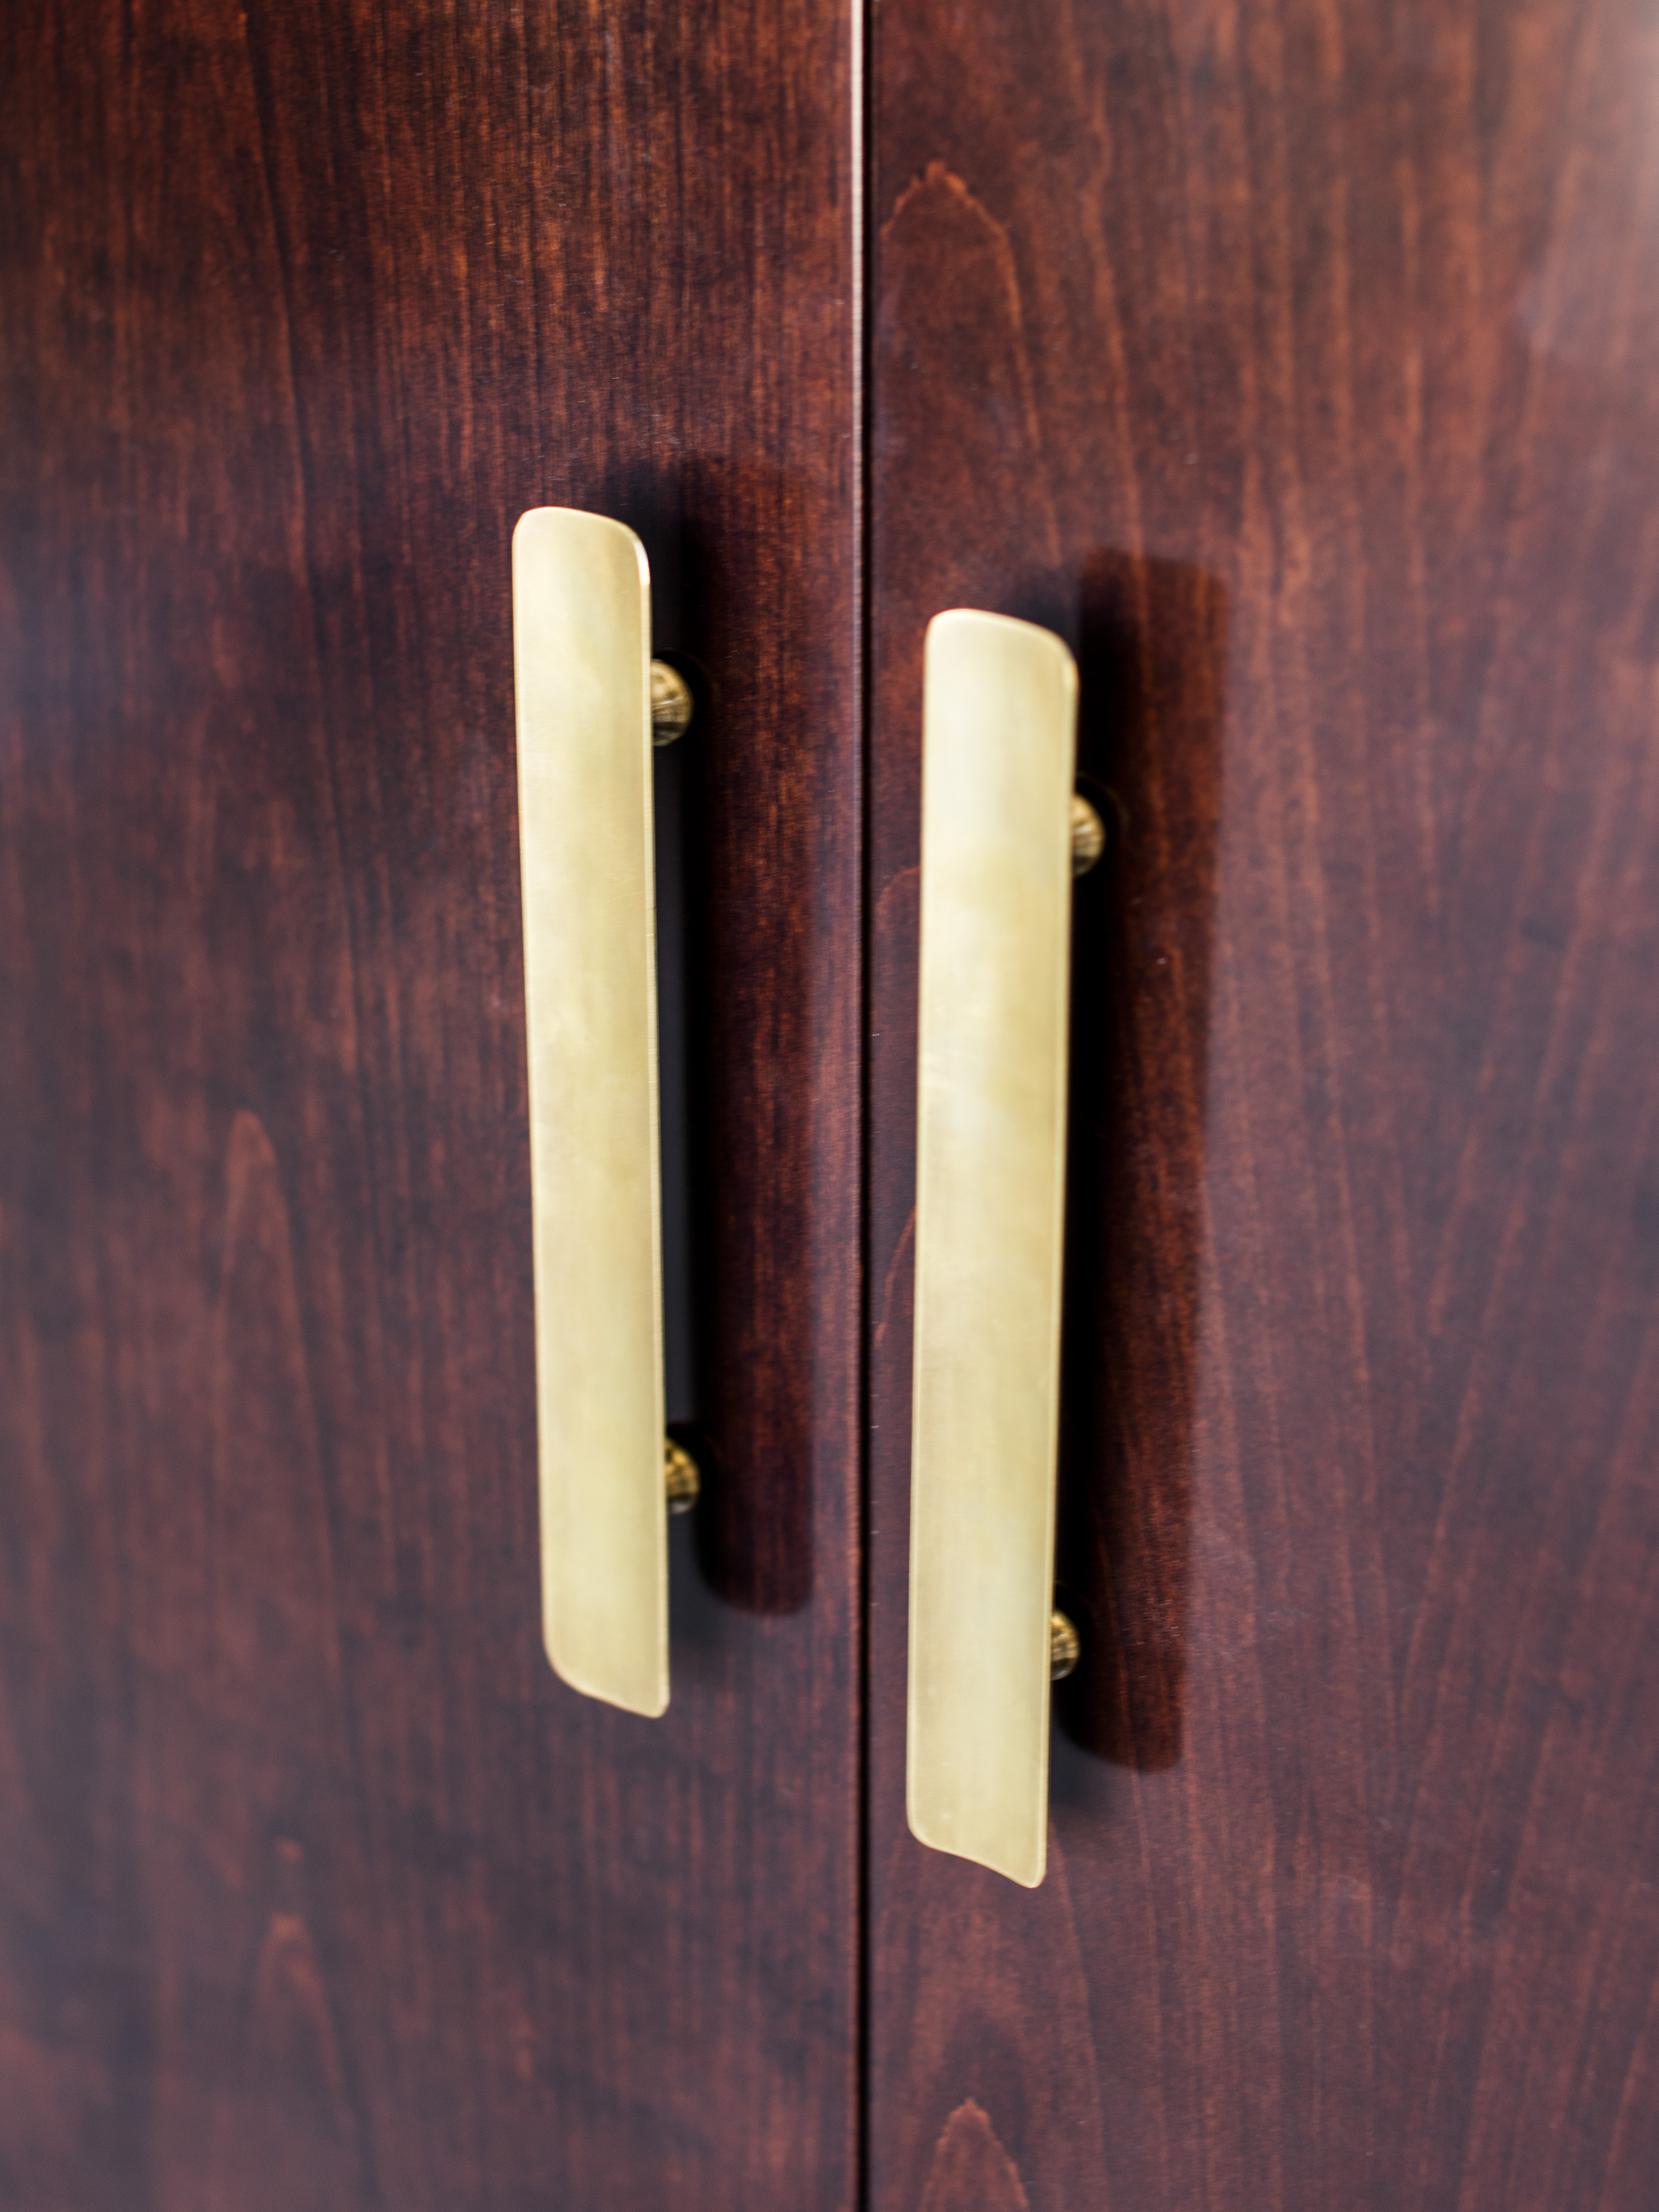 uffizi bar handles detail